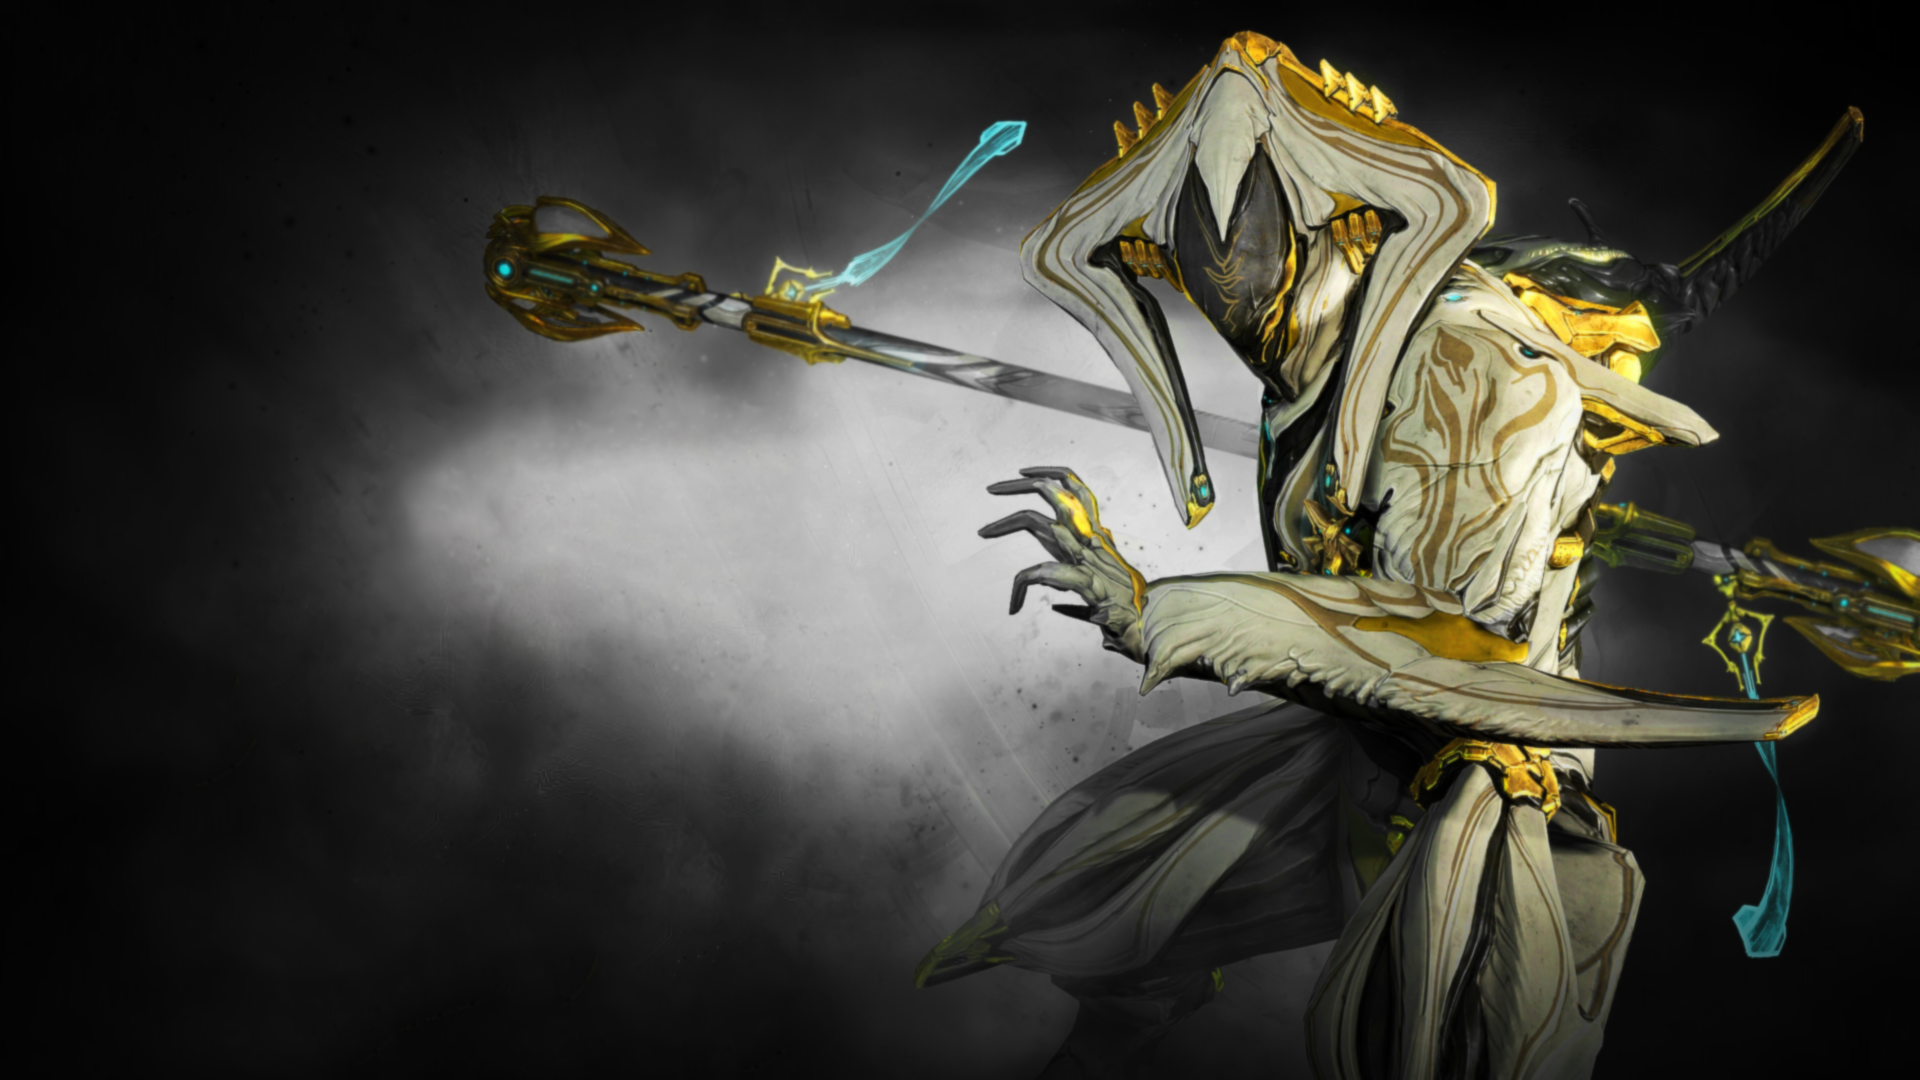 Loki Prime [WARFRAME] by Mbah1221 1920x1080